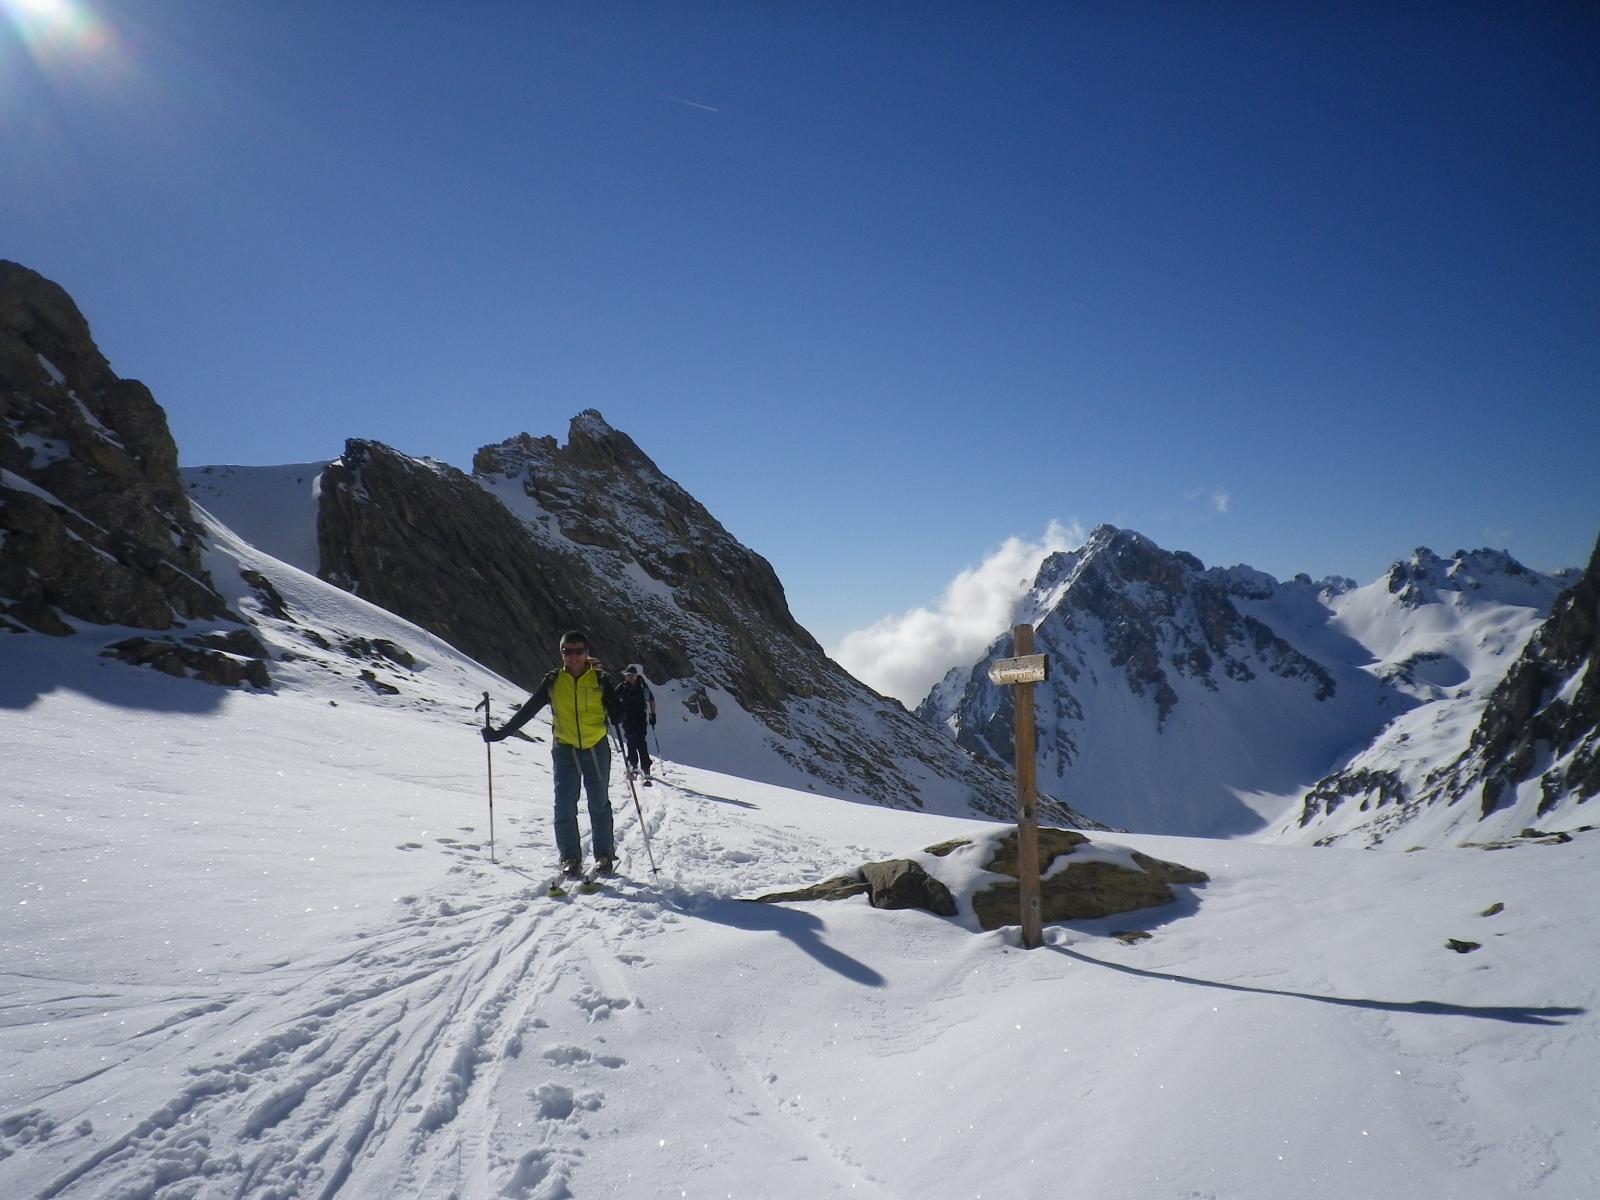 A spasso per montagne splendide